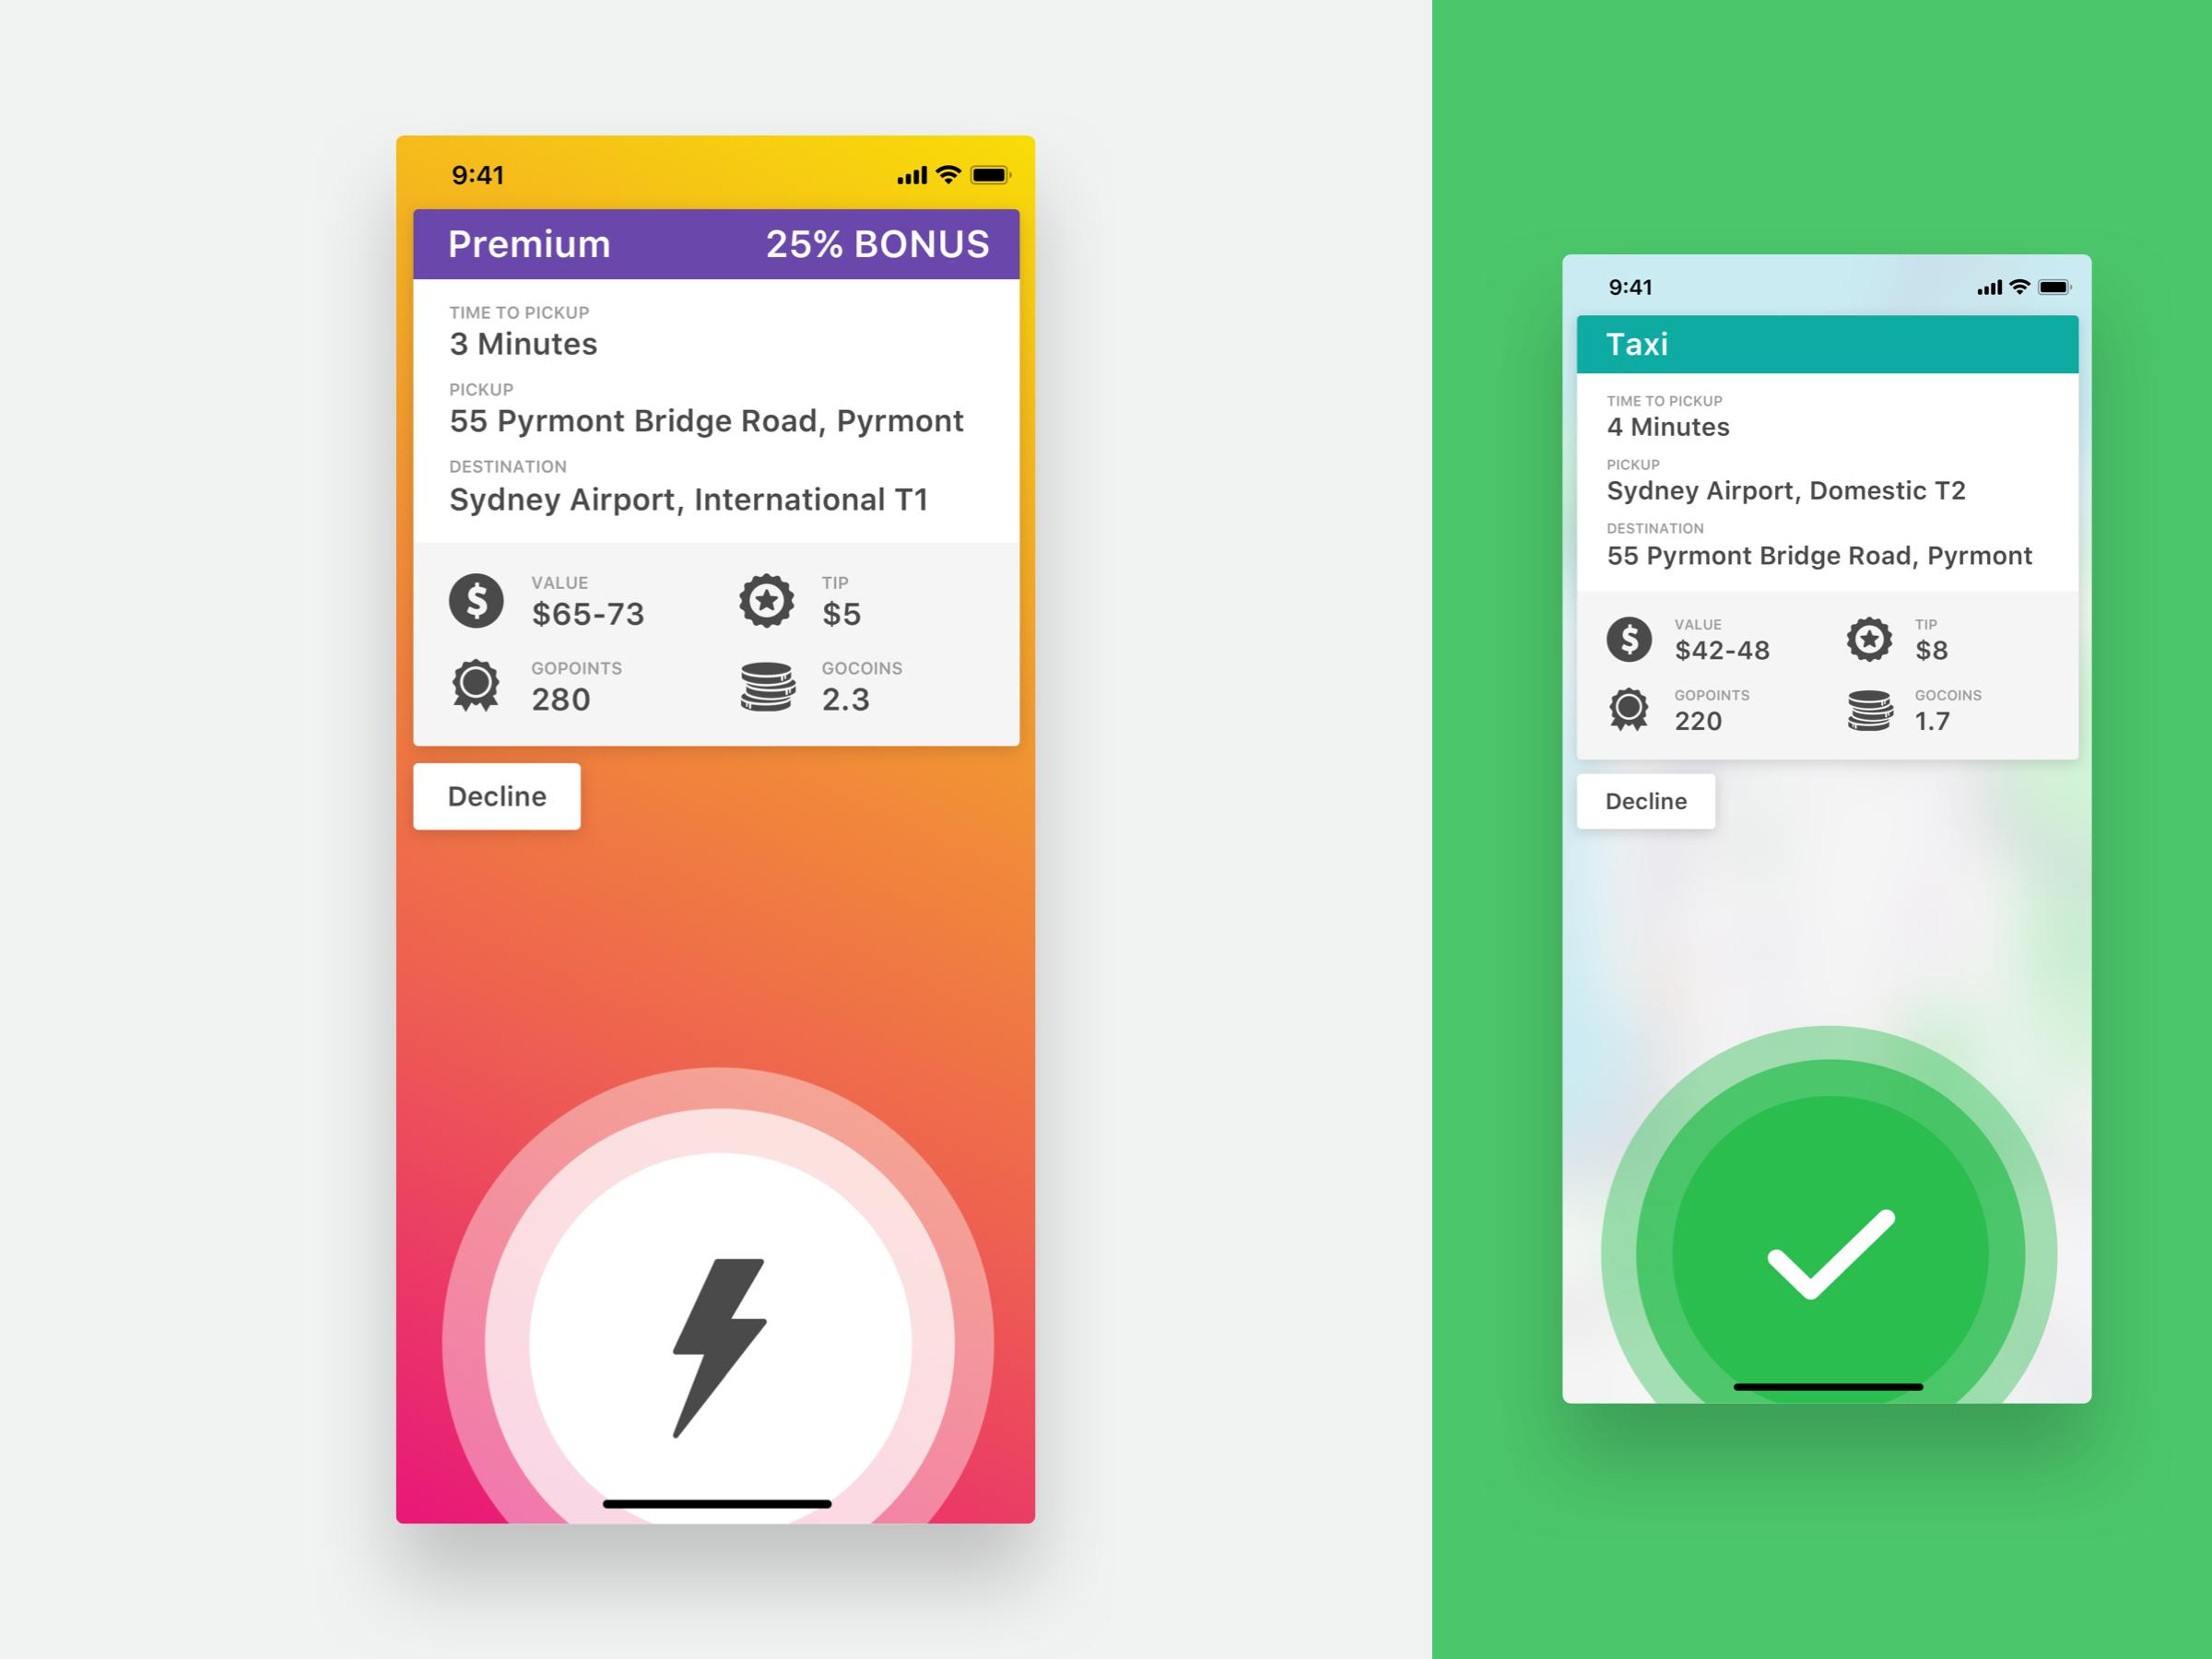 GoCatch Driver App • Trip Offer by Alex | Dribbble | Dribbble